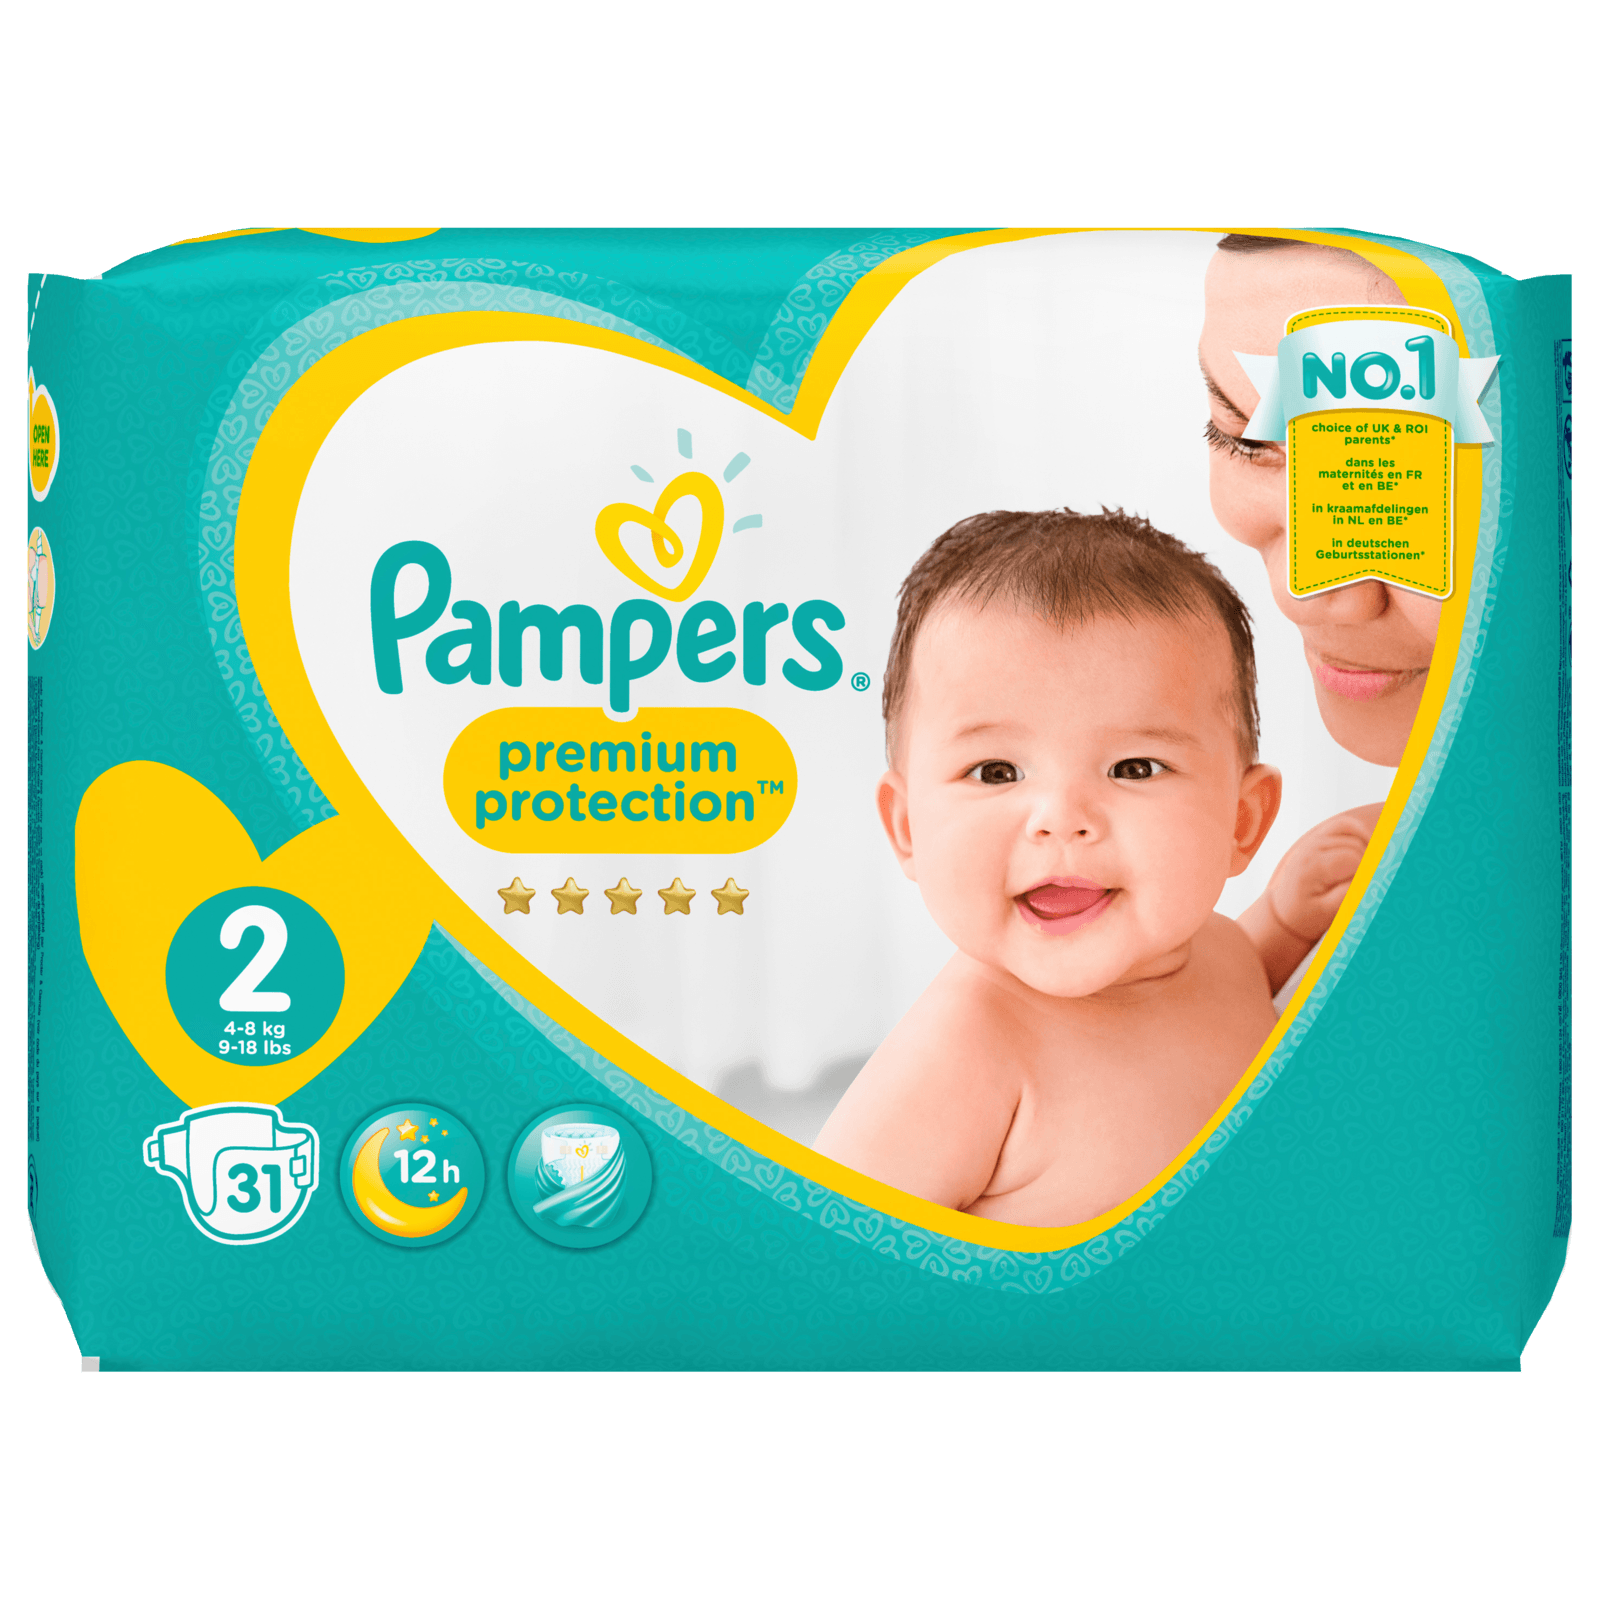 PAMPERS ANGEBOTE HAMBURG